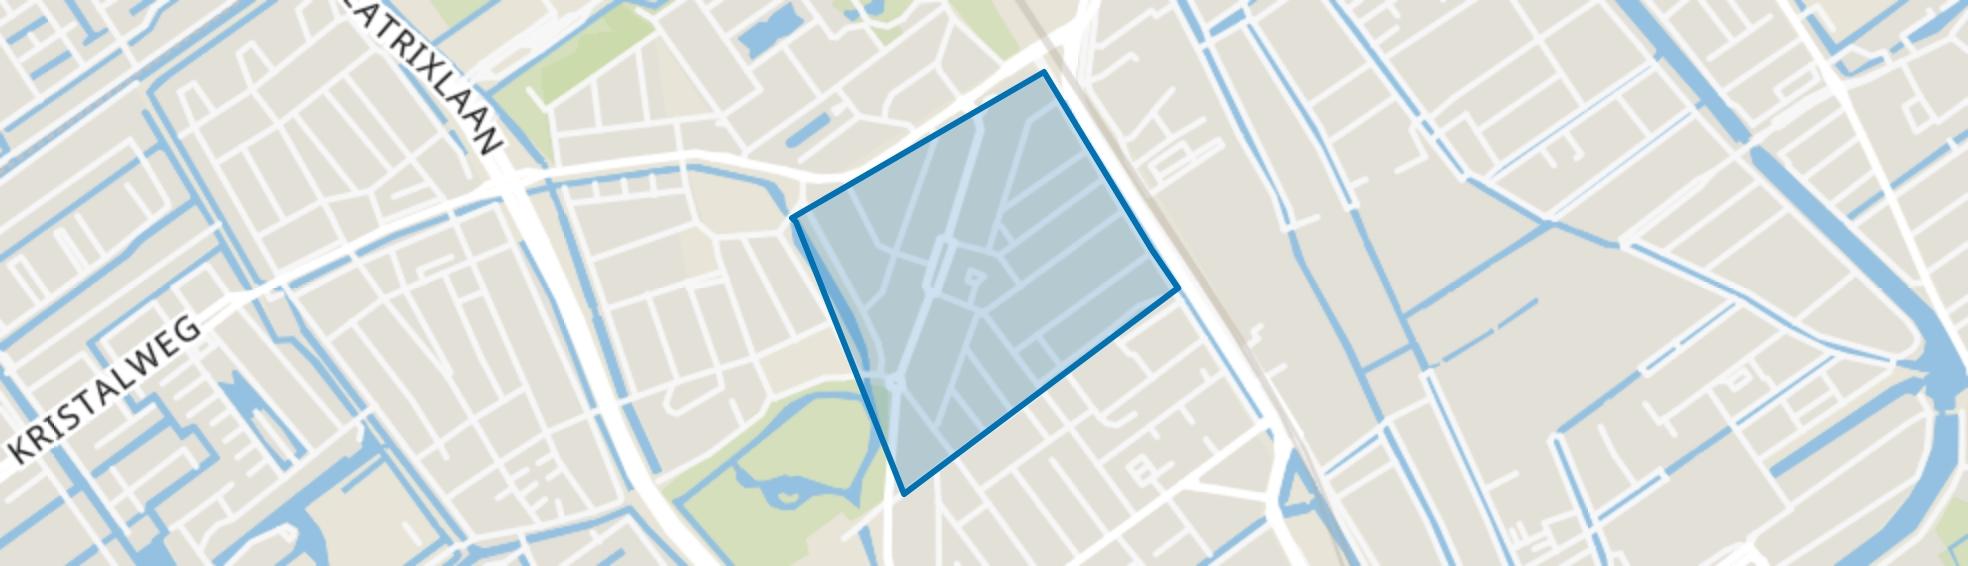 Ministersbuurt-Oost, Delft map